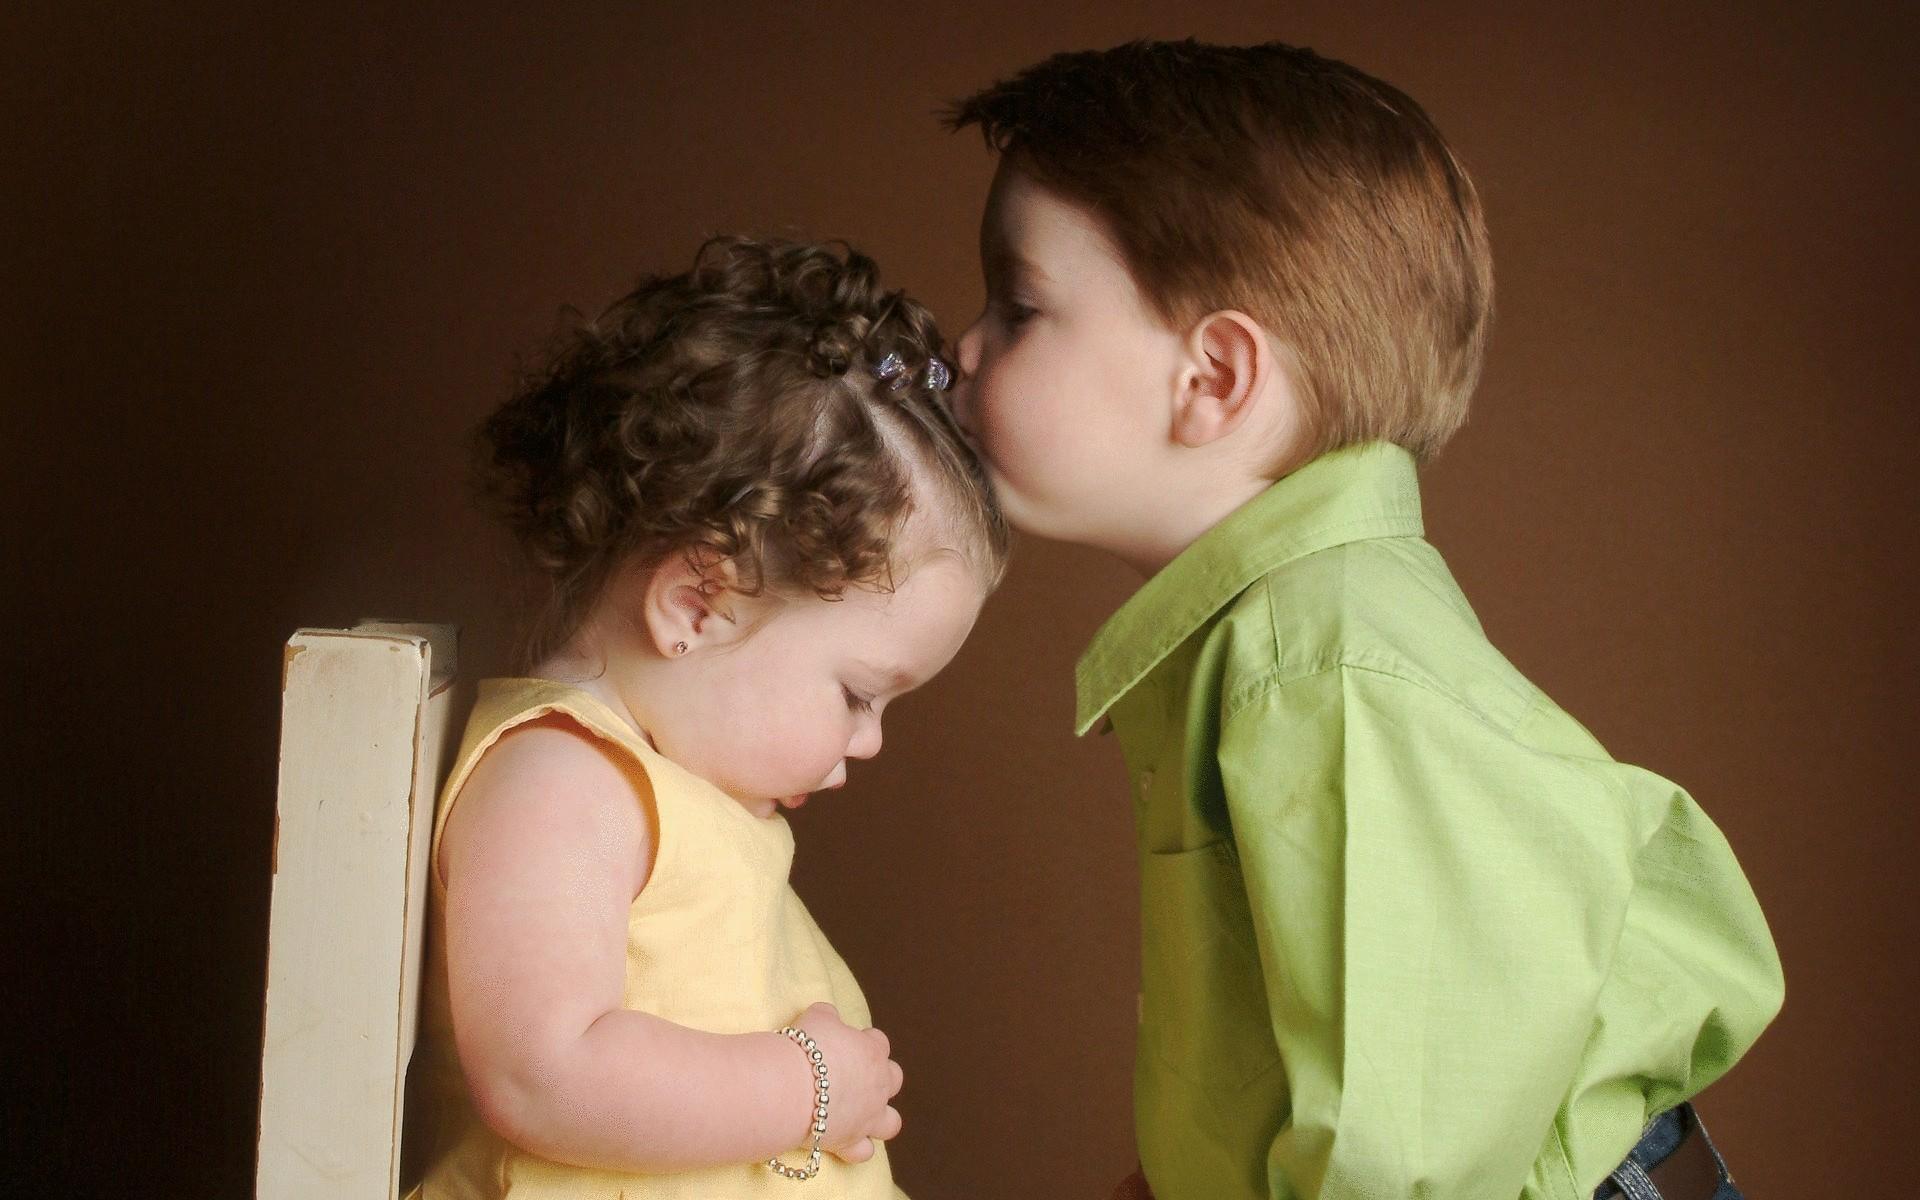 дочка картинки целующих малышей вот при съемке